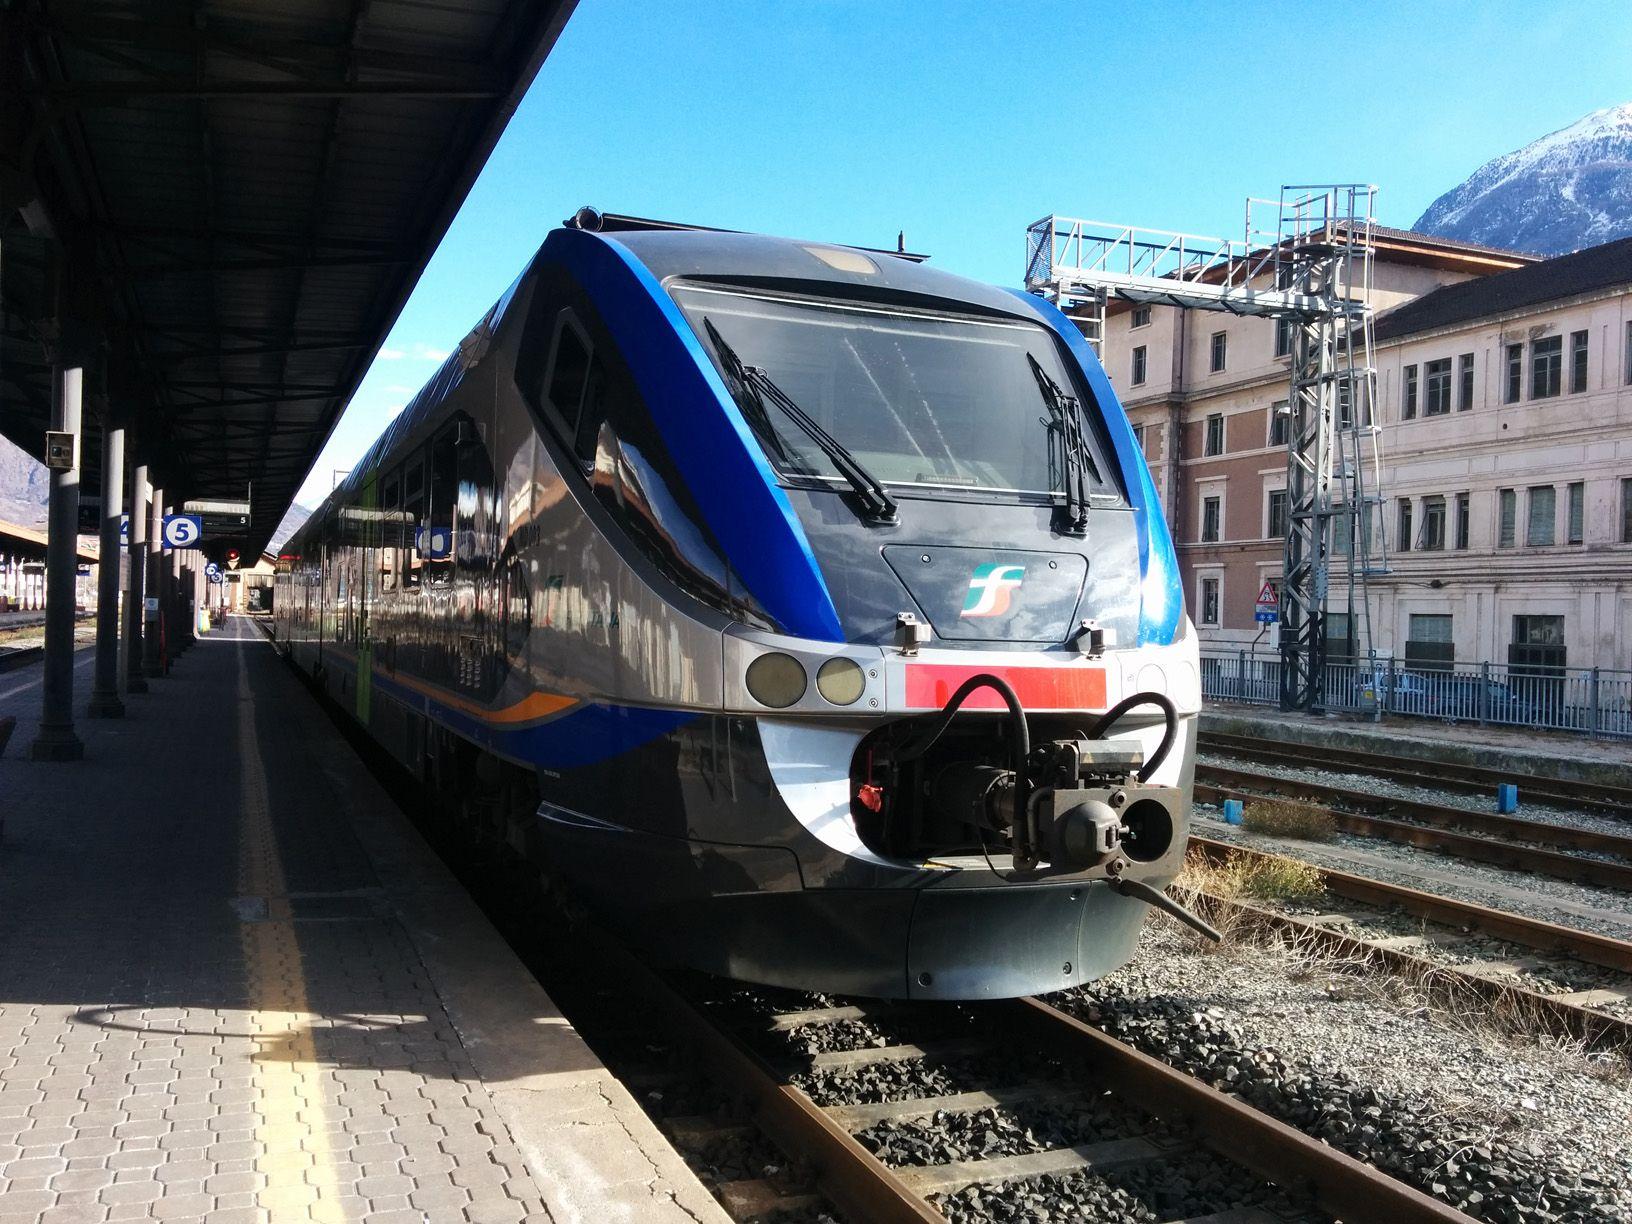 IVREA - Così la linea Ivrea-Aosta diventa «enogastronomica»